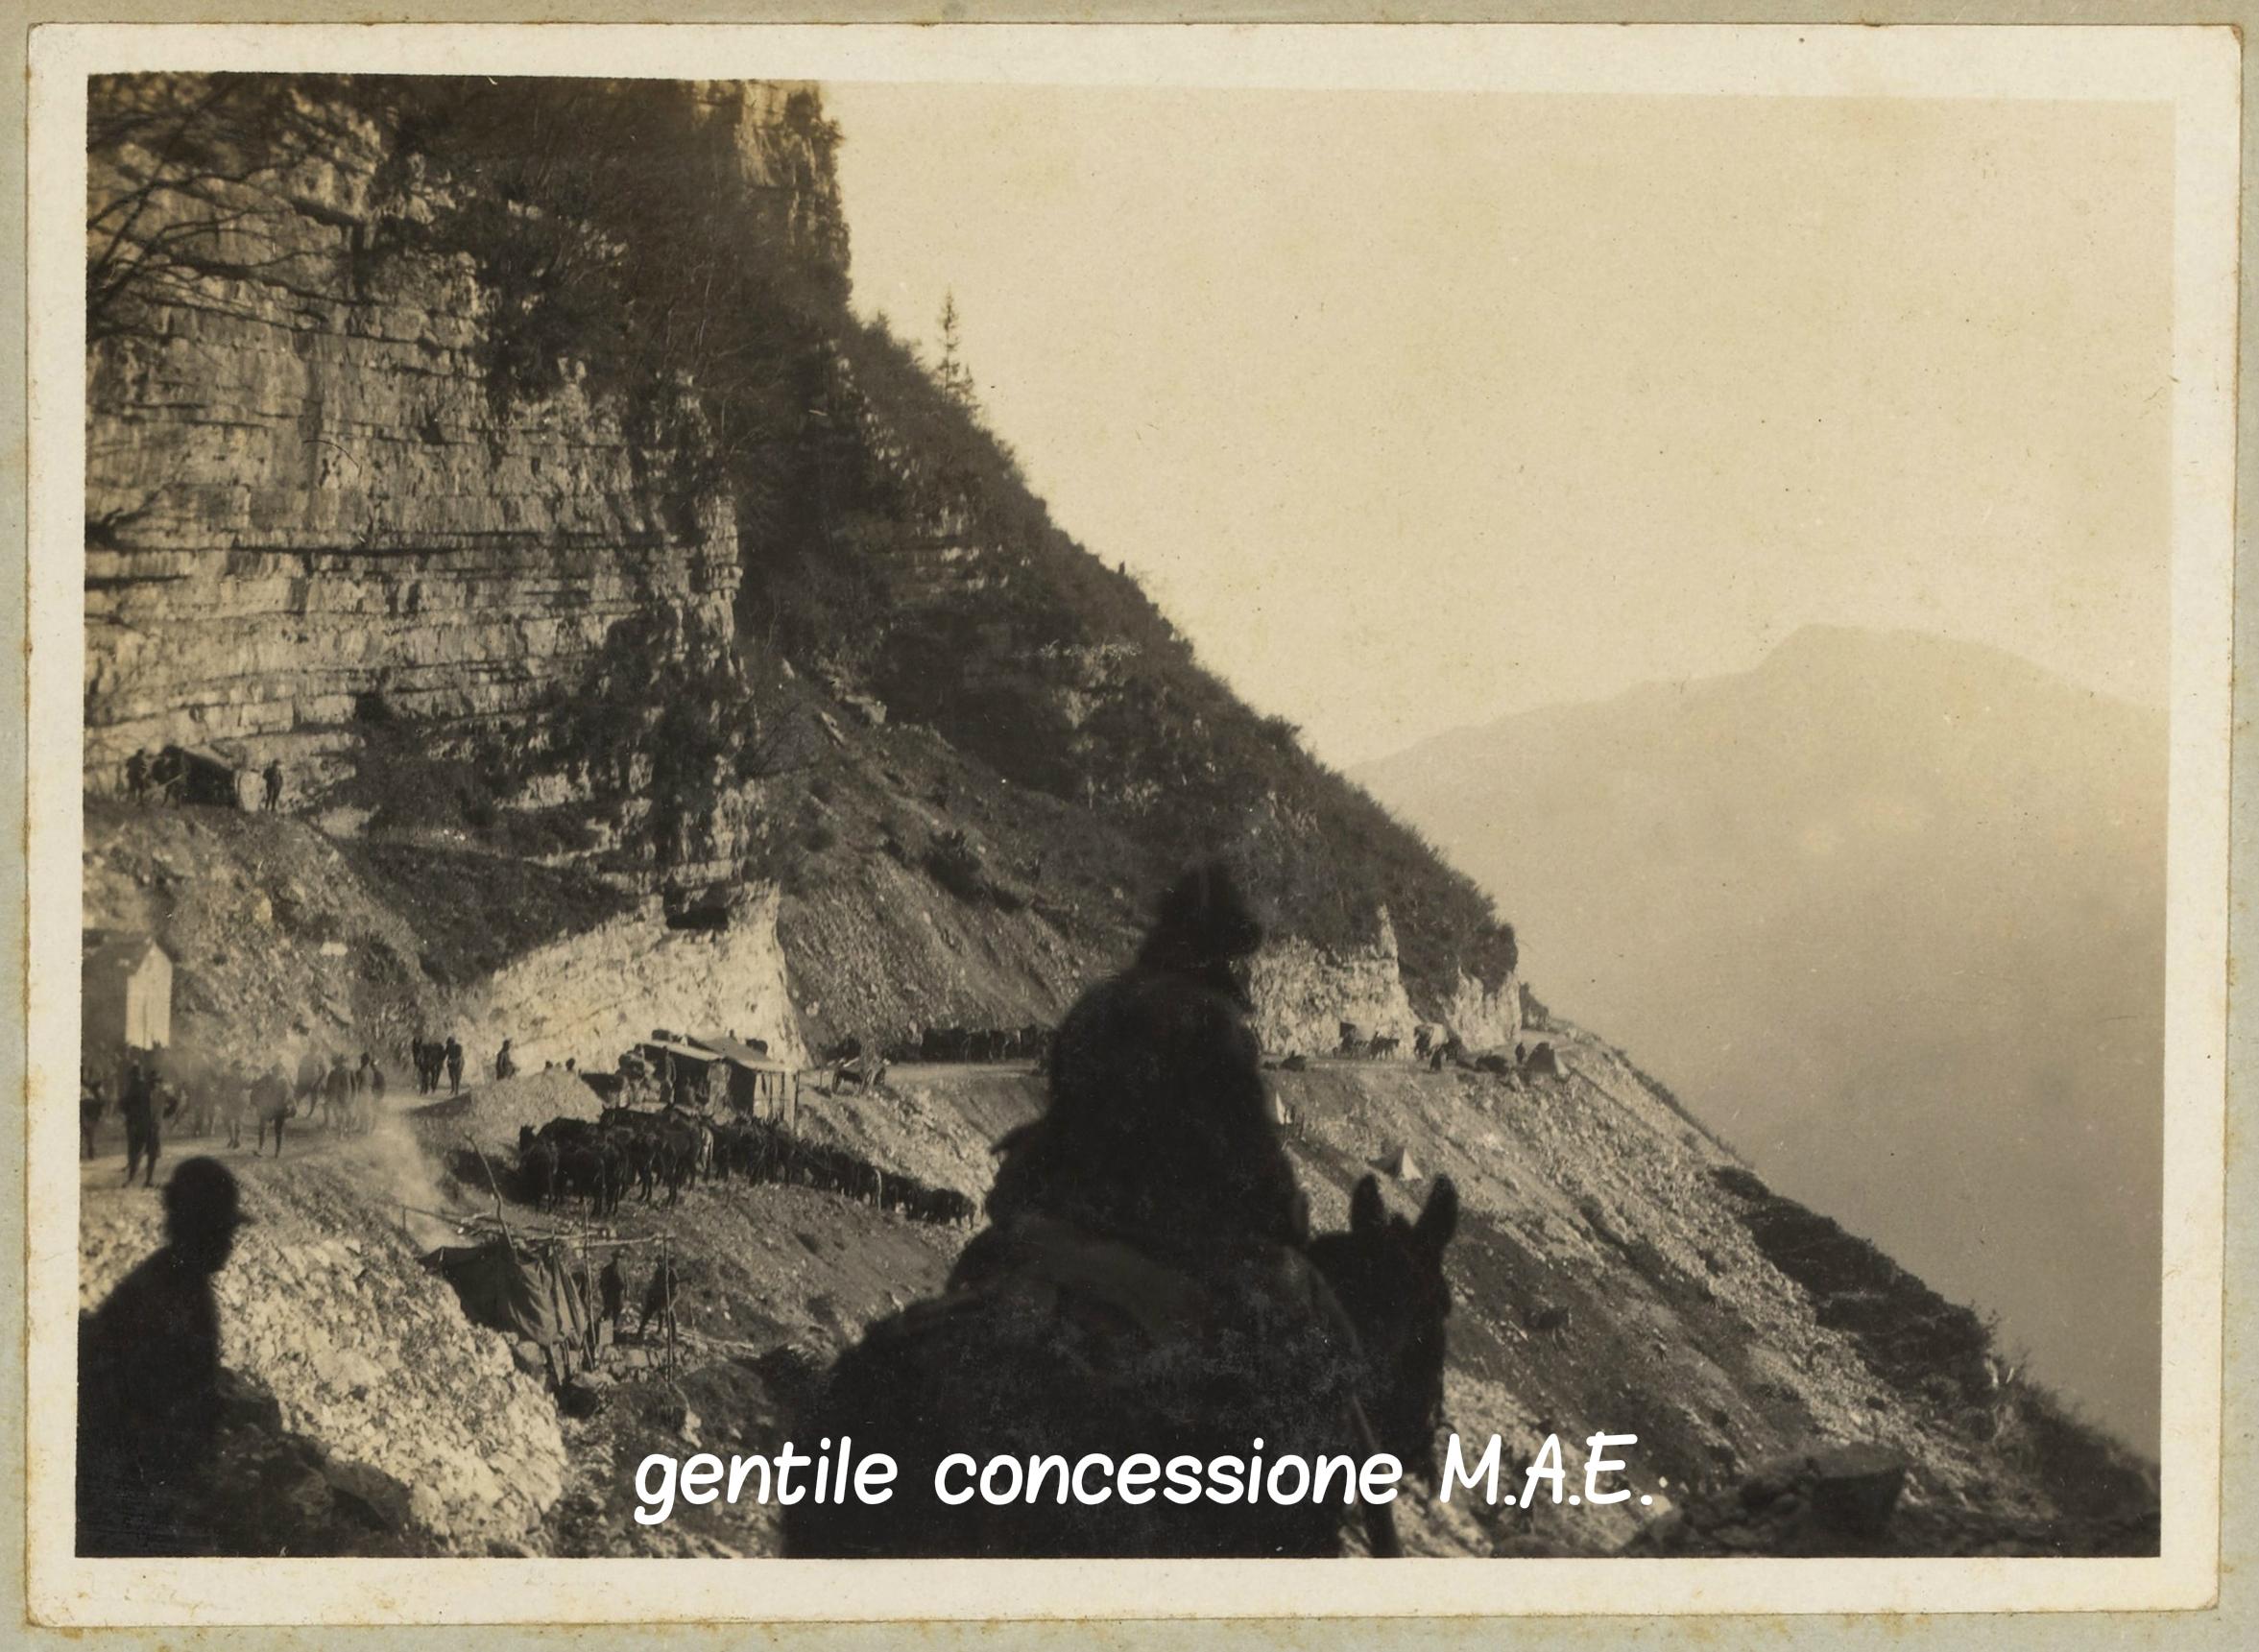 07 - Salmerie italiane lungo la rotabile Valstagna - Foza - Mae (c).jpg